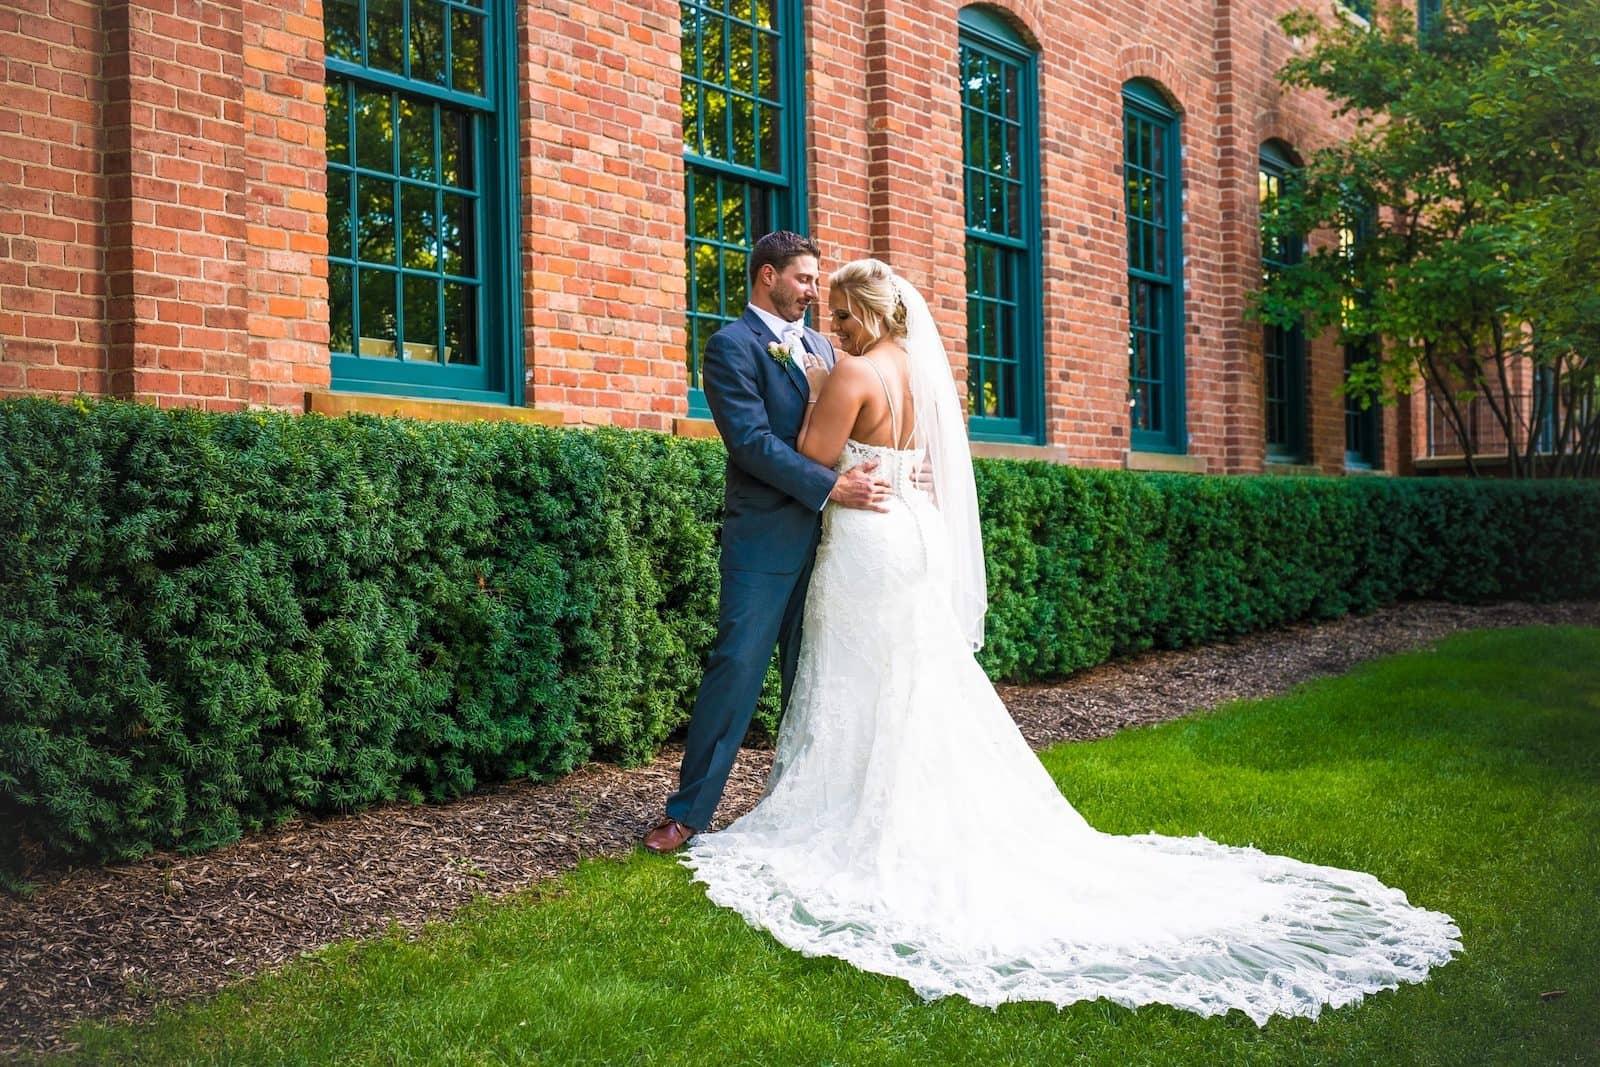 bride and groom romantics on wedding day